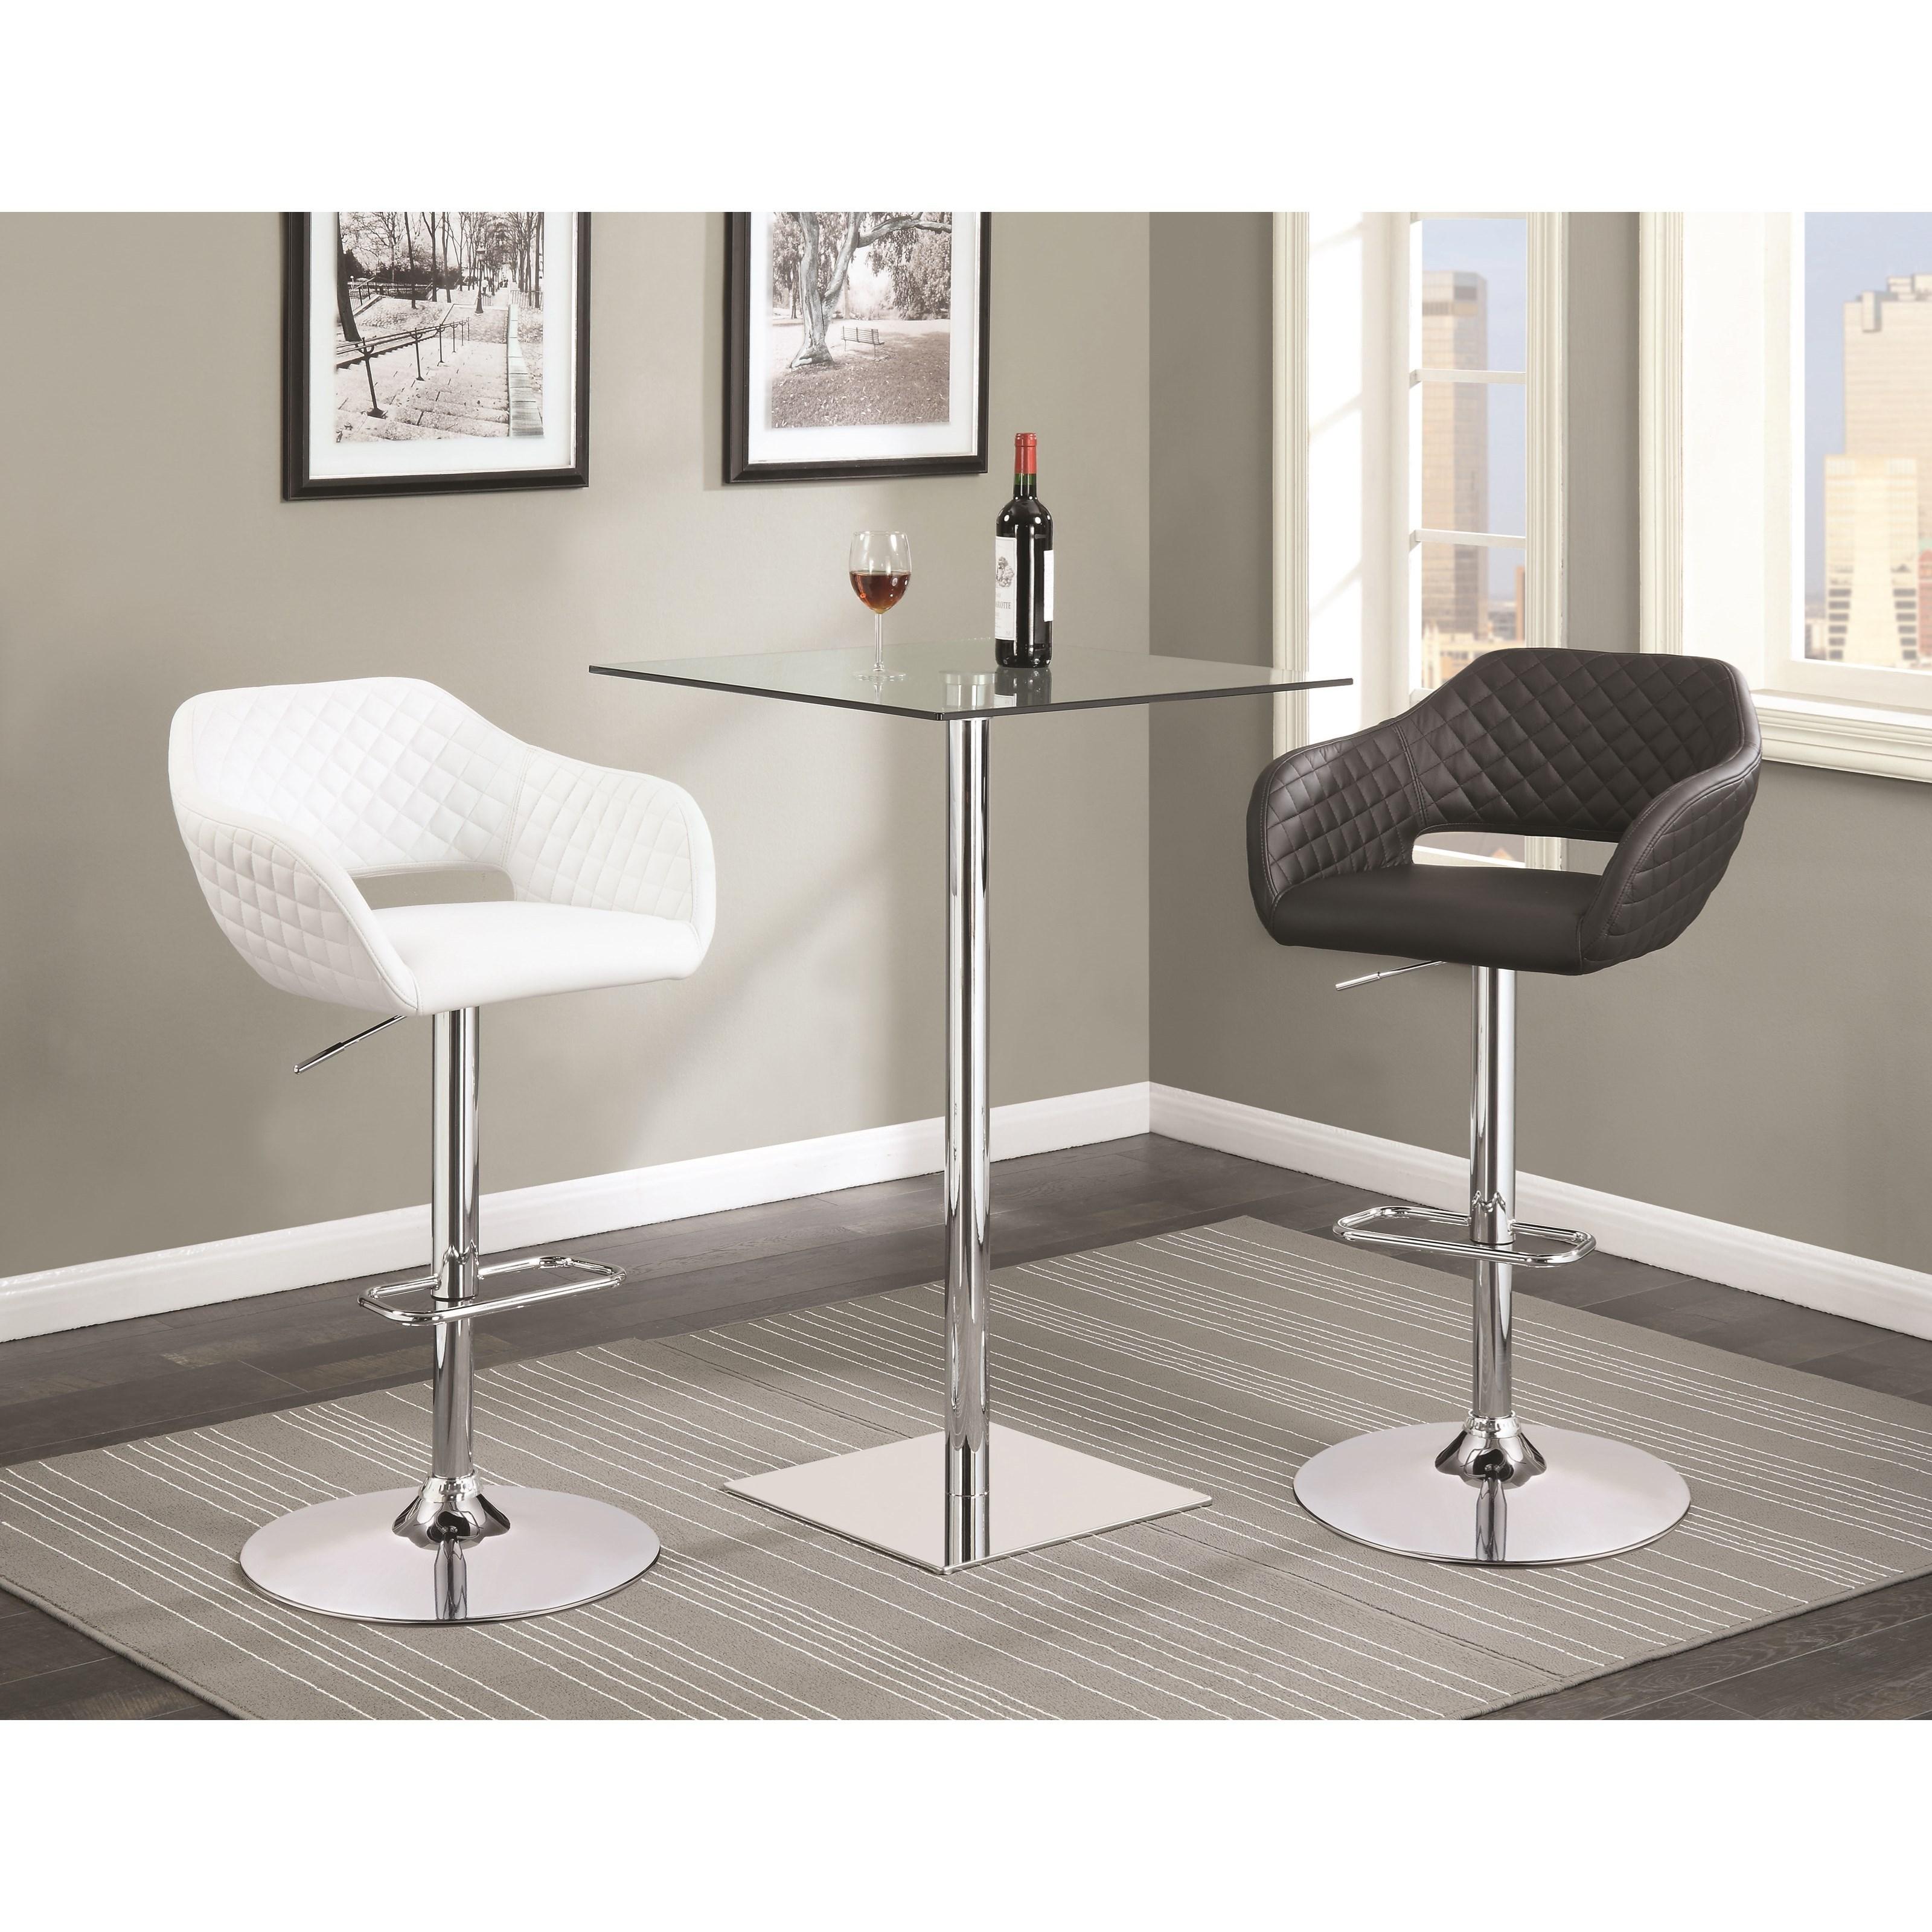 Coaster Bar Units And Bar Tables Contemporary Bar Table And Stool Set